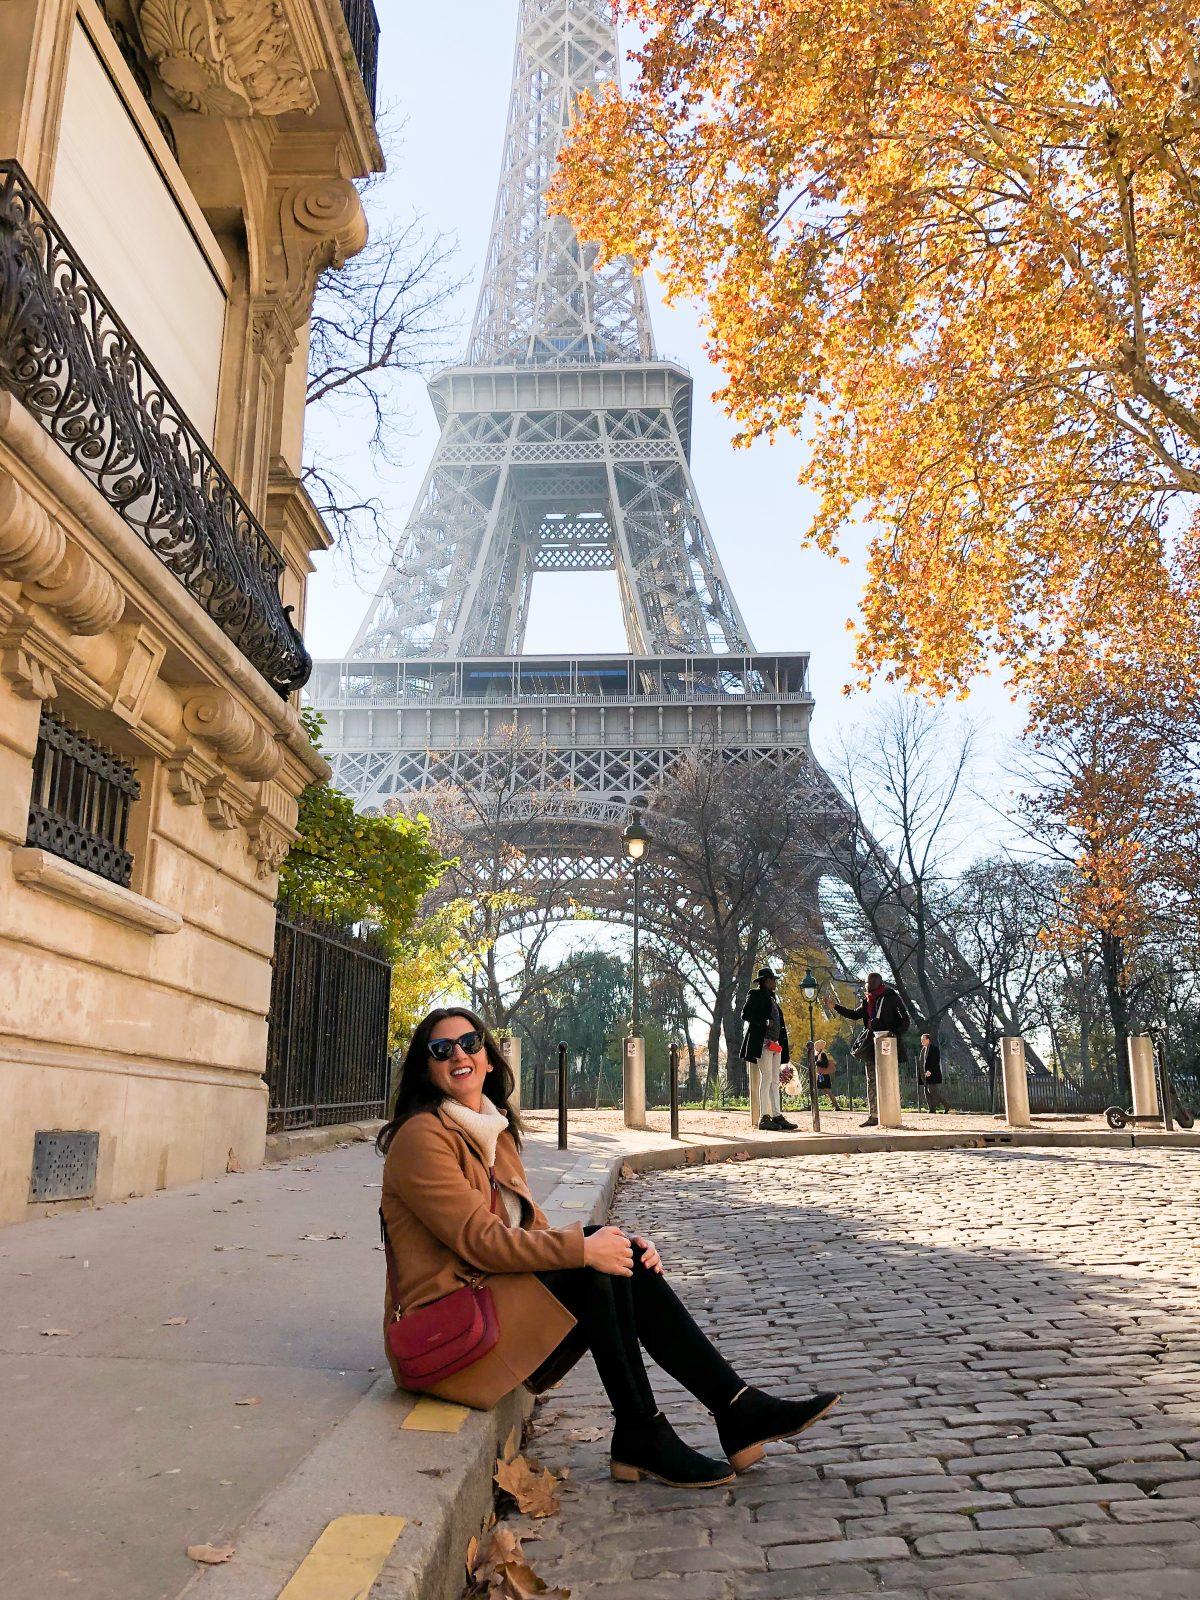 15 of the Best Instagrammable Spots in Paris